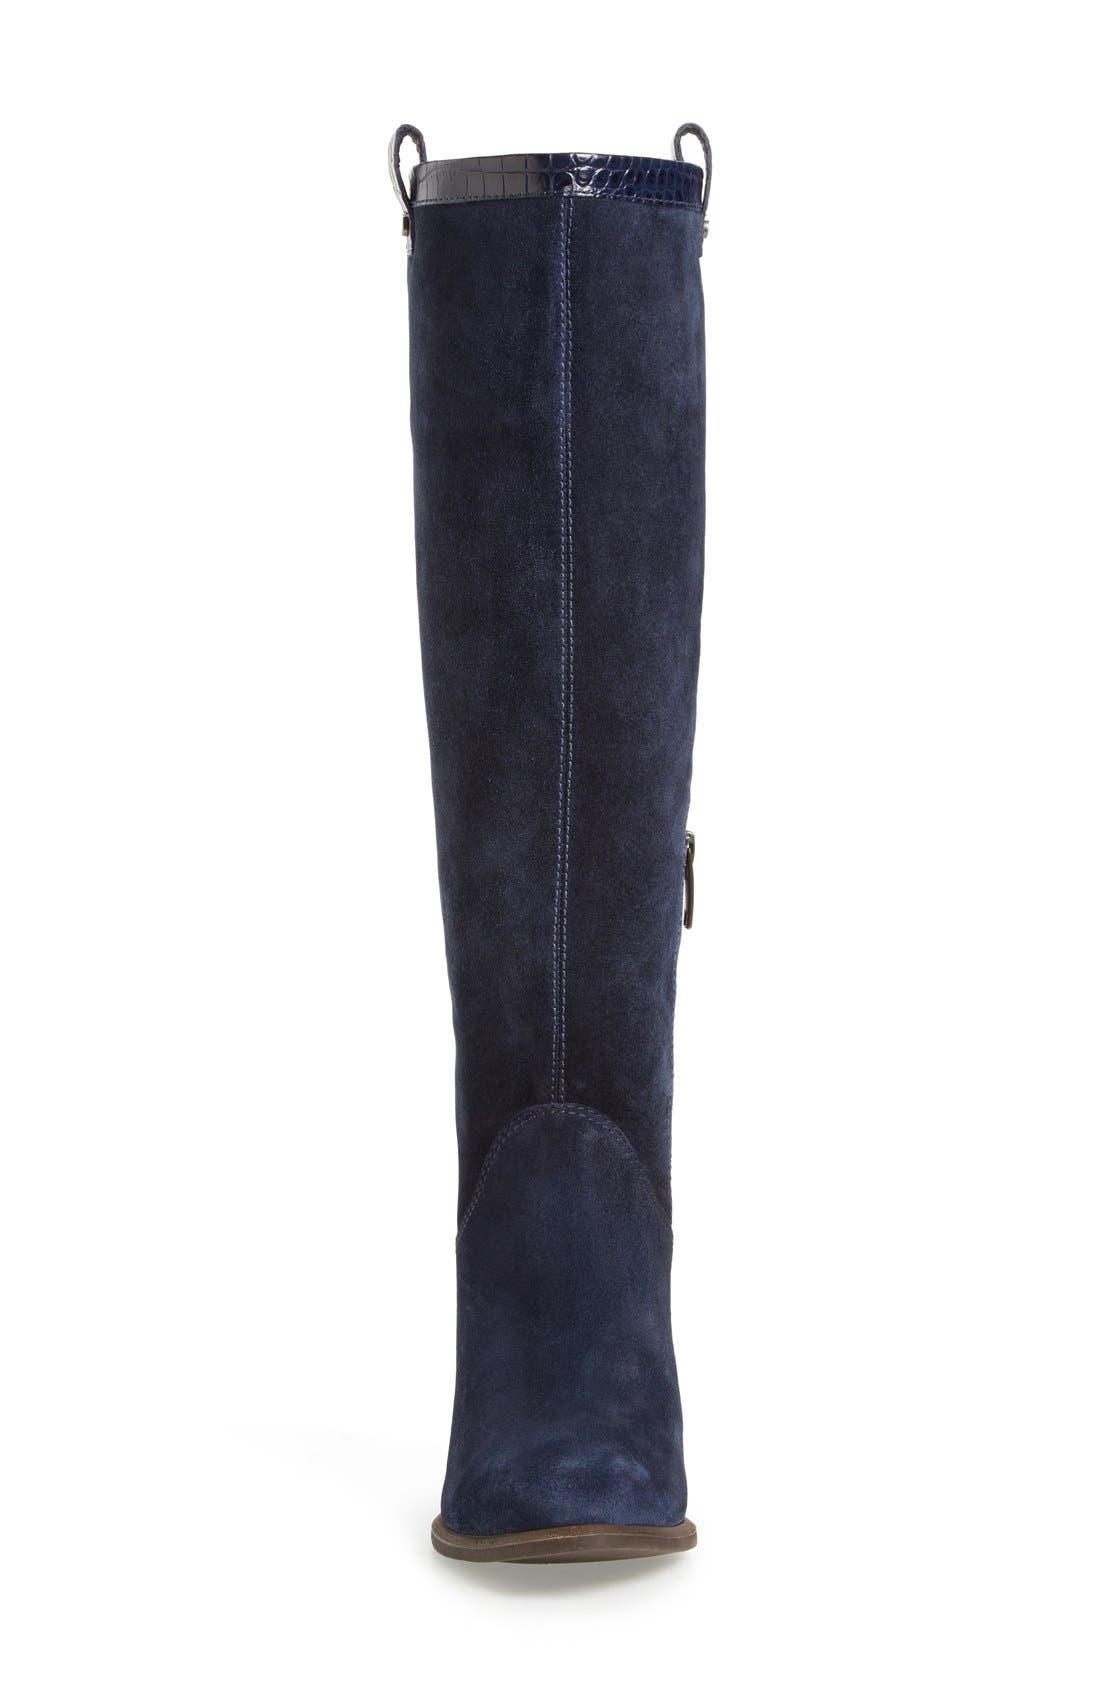 Alternate Image 3  - UGG® 'Ava Croco' Tall Suede Boot (Women)